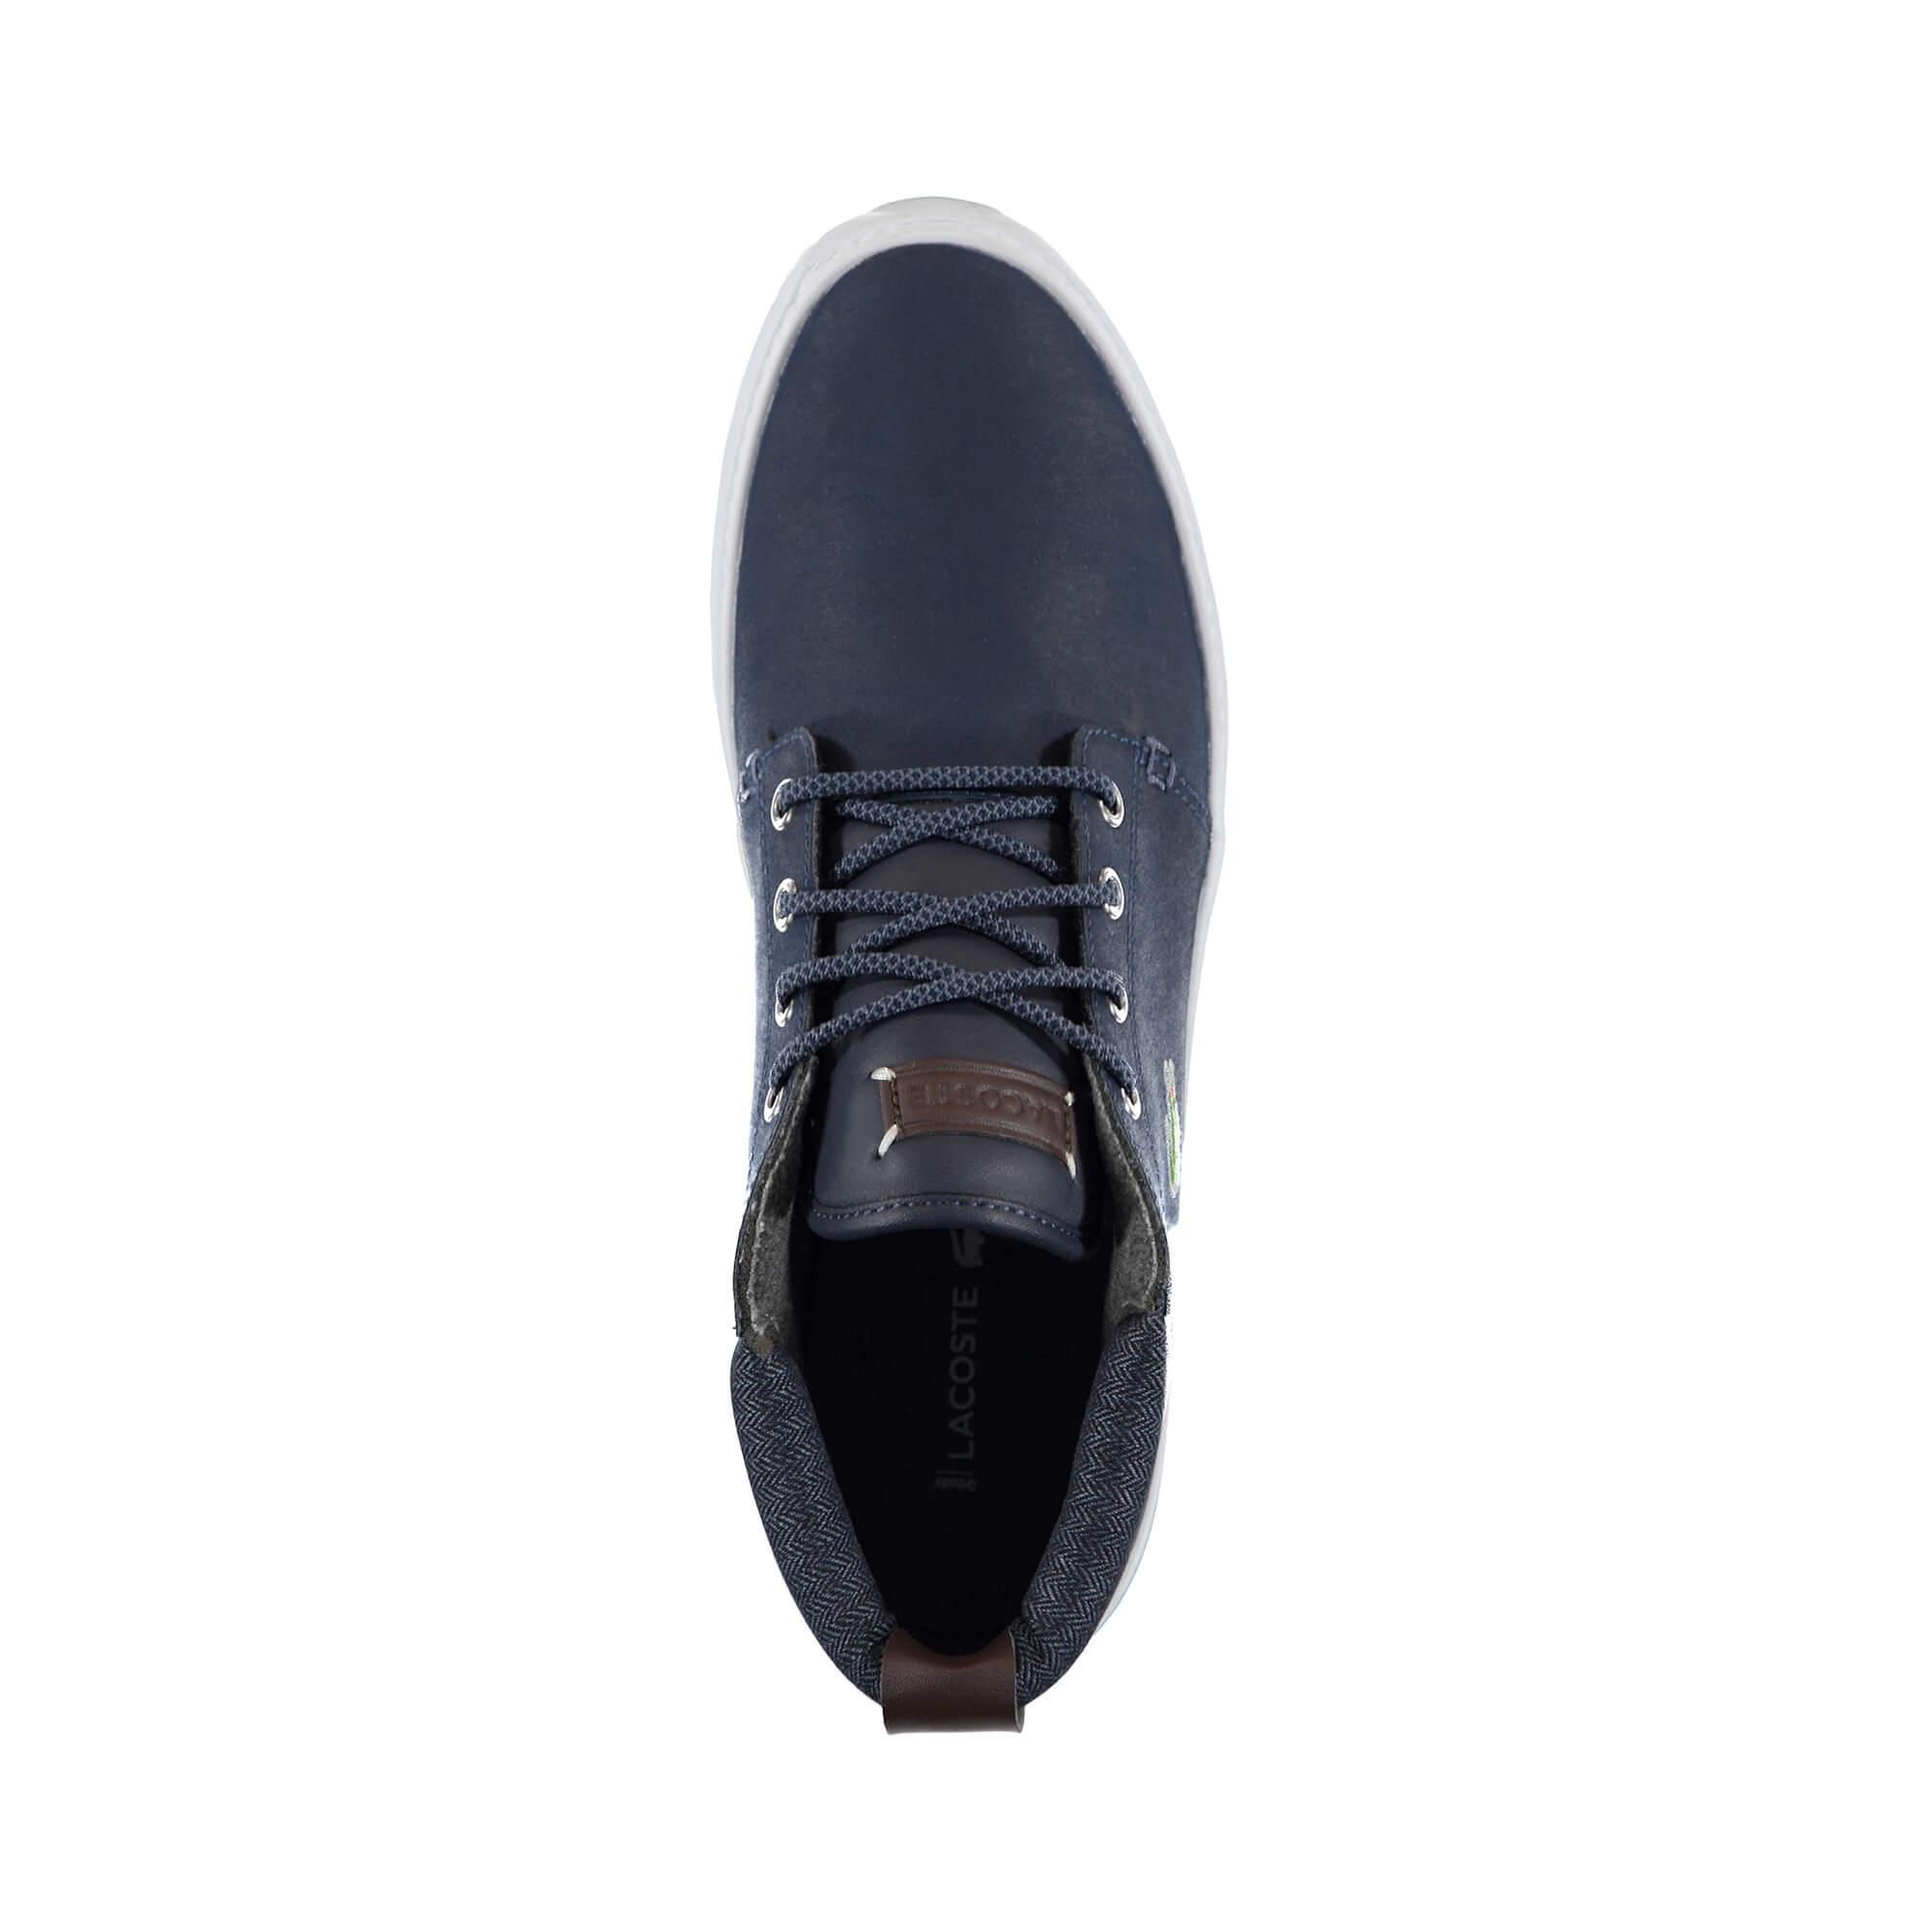 Lacoste Erkek Ampthill Terra 318 1 Lacivert Ayakkabı